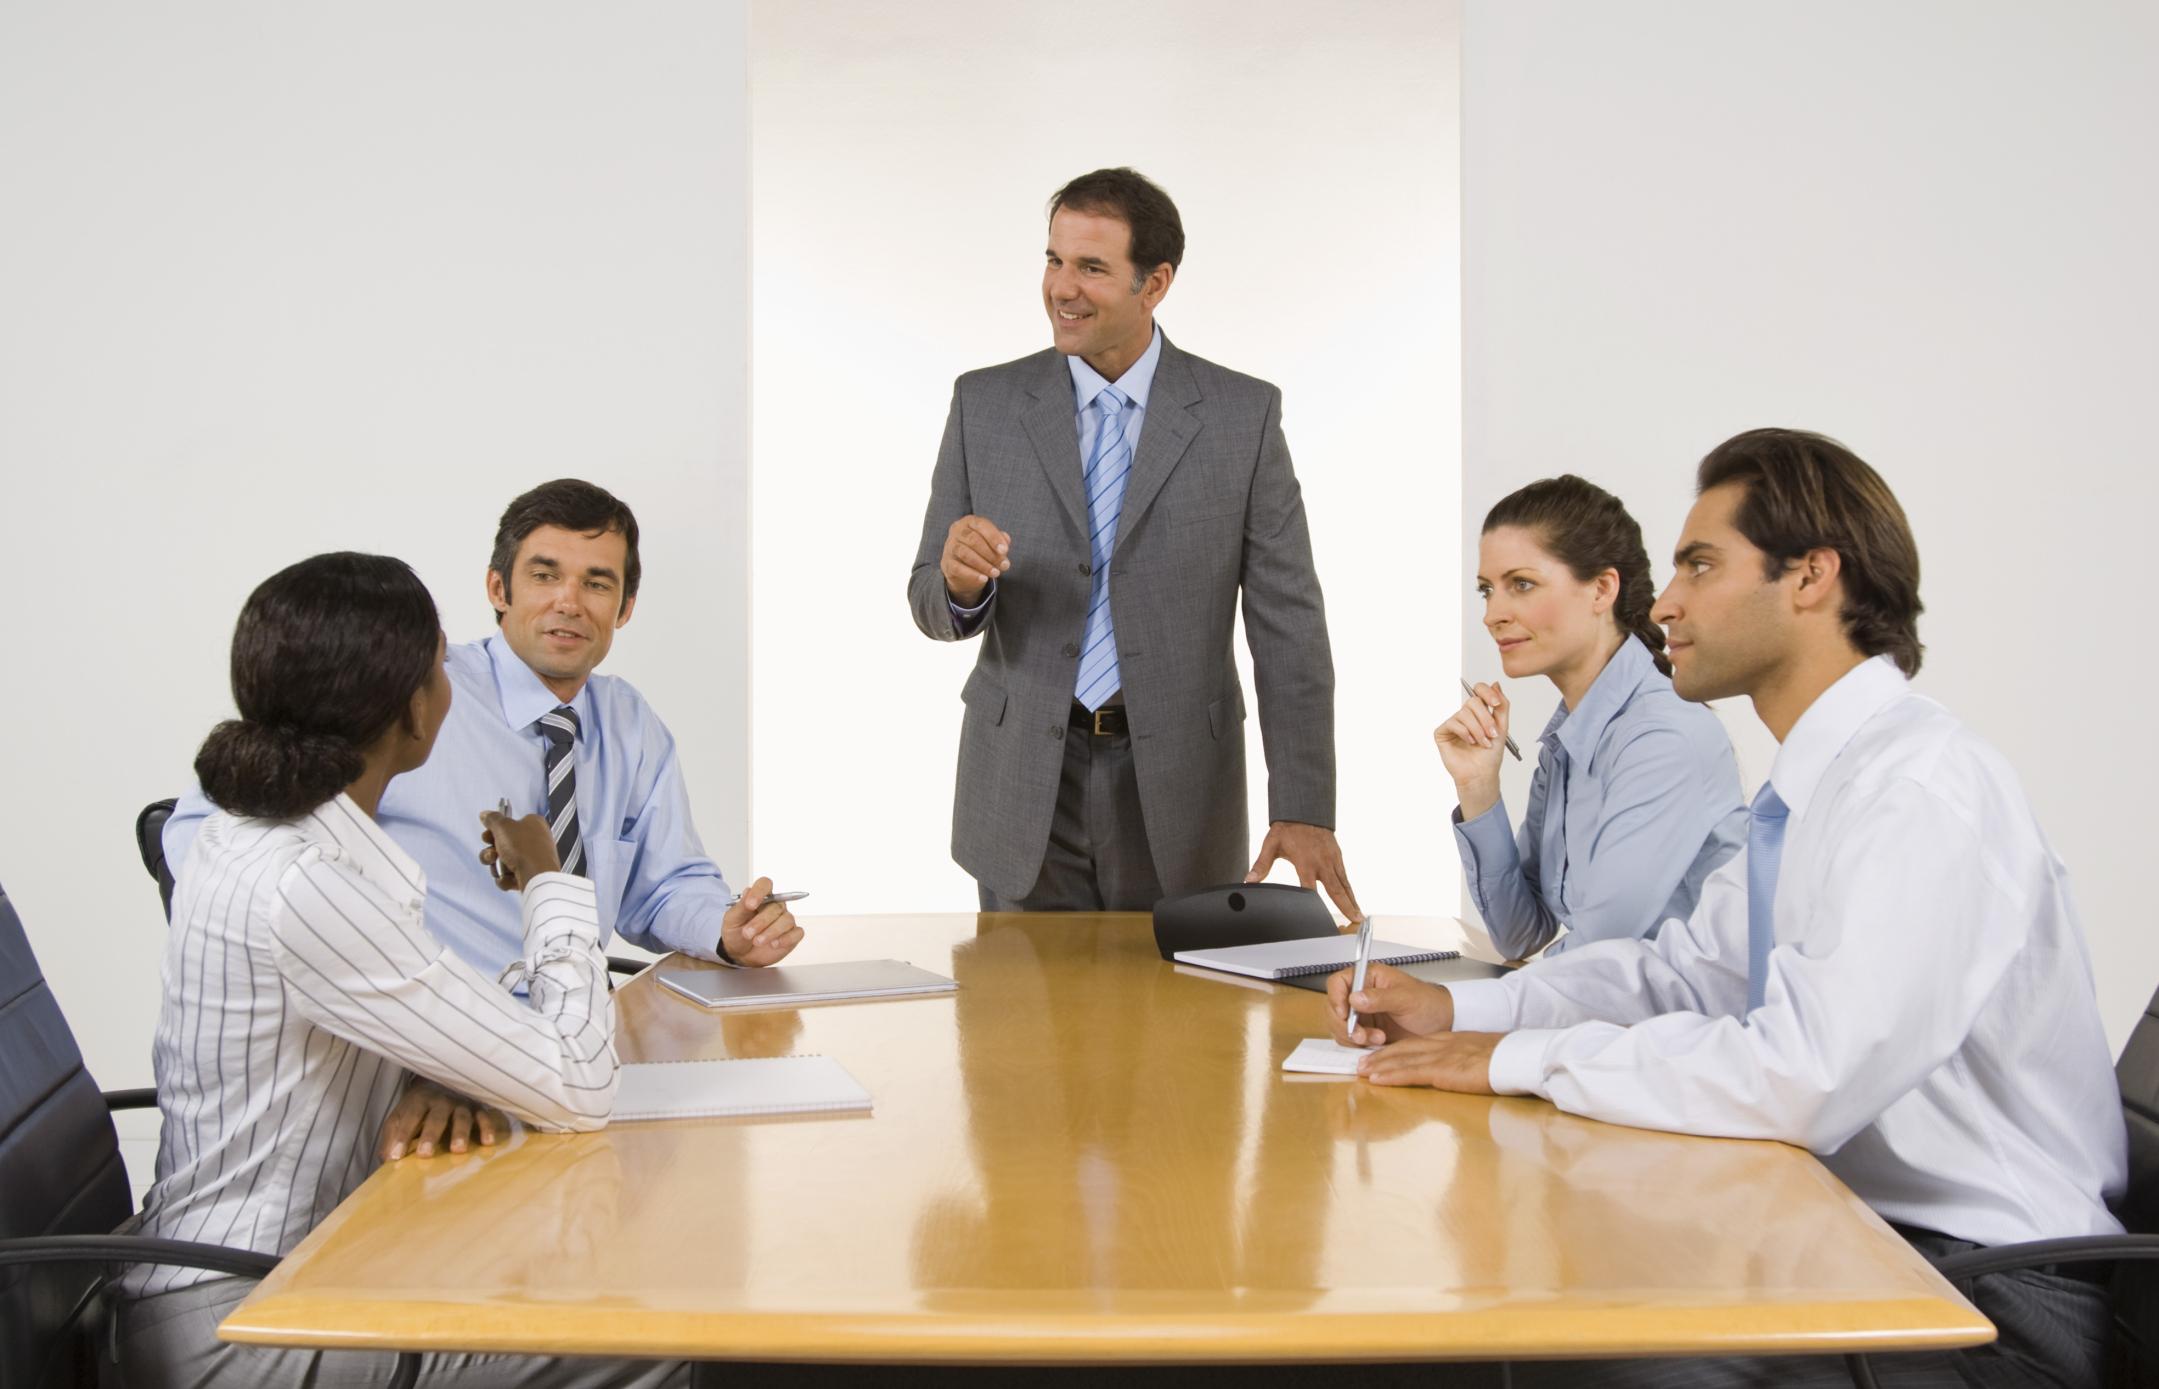 persuasive communication model